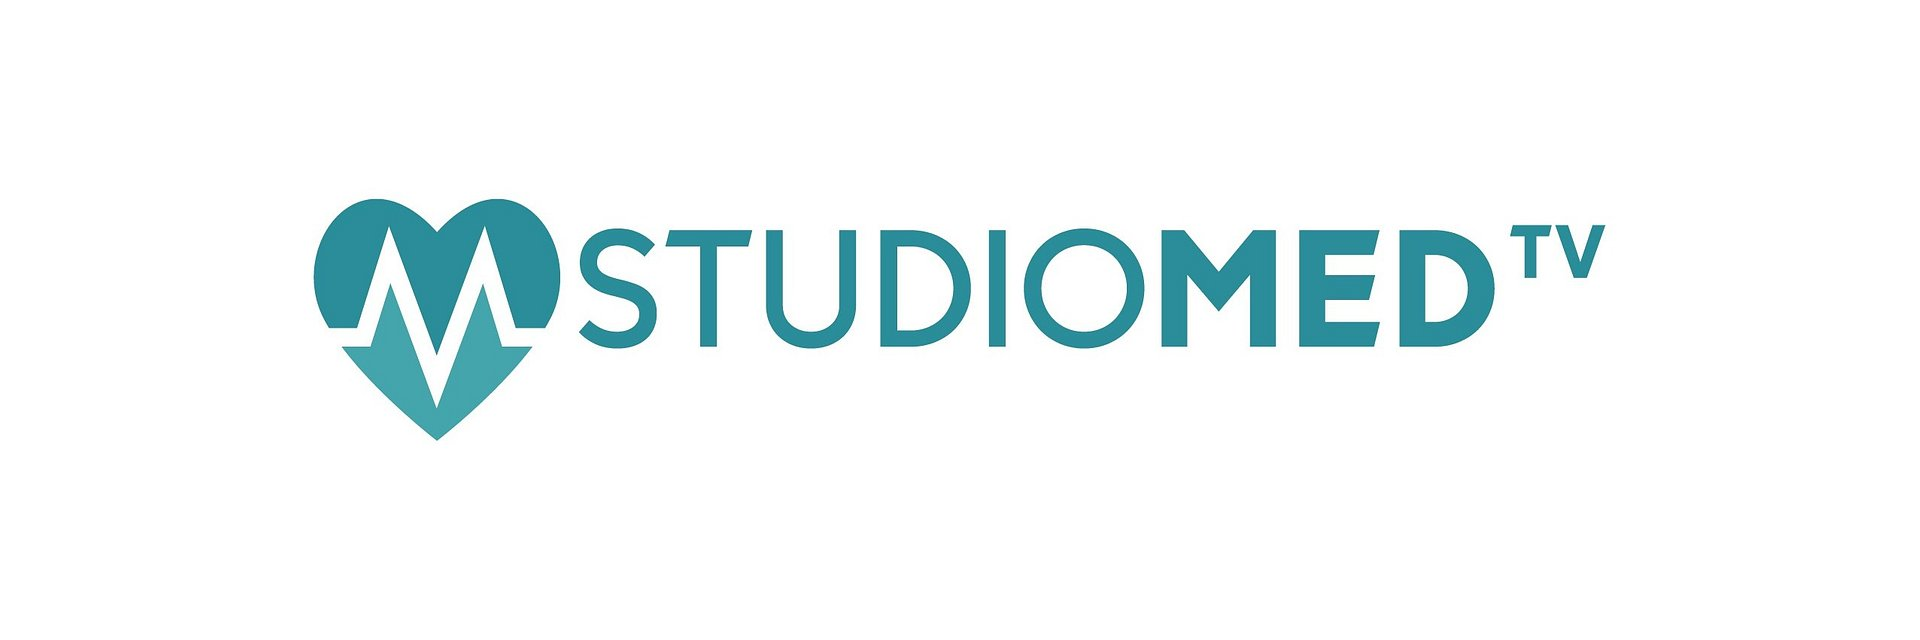 Kanał STUDIOMED TV w ofercie TVN Media od sierpnia 2019